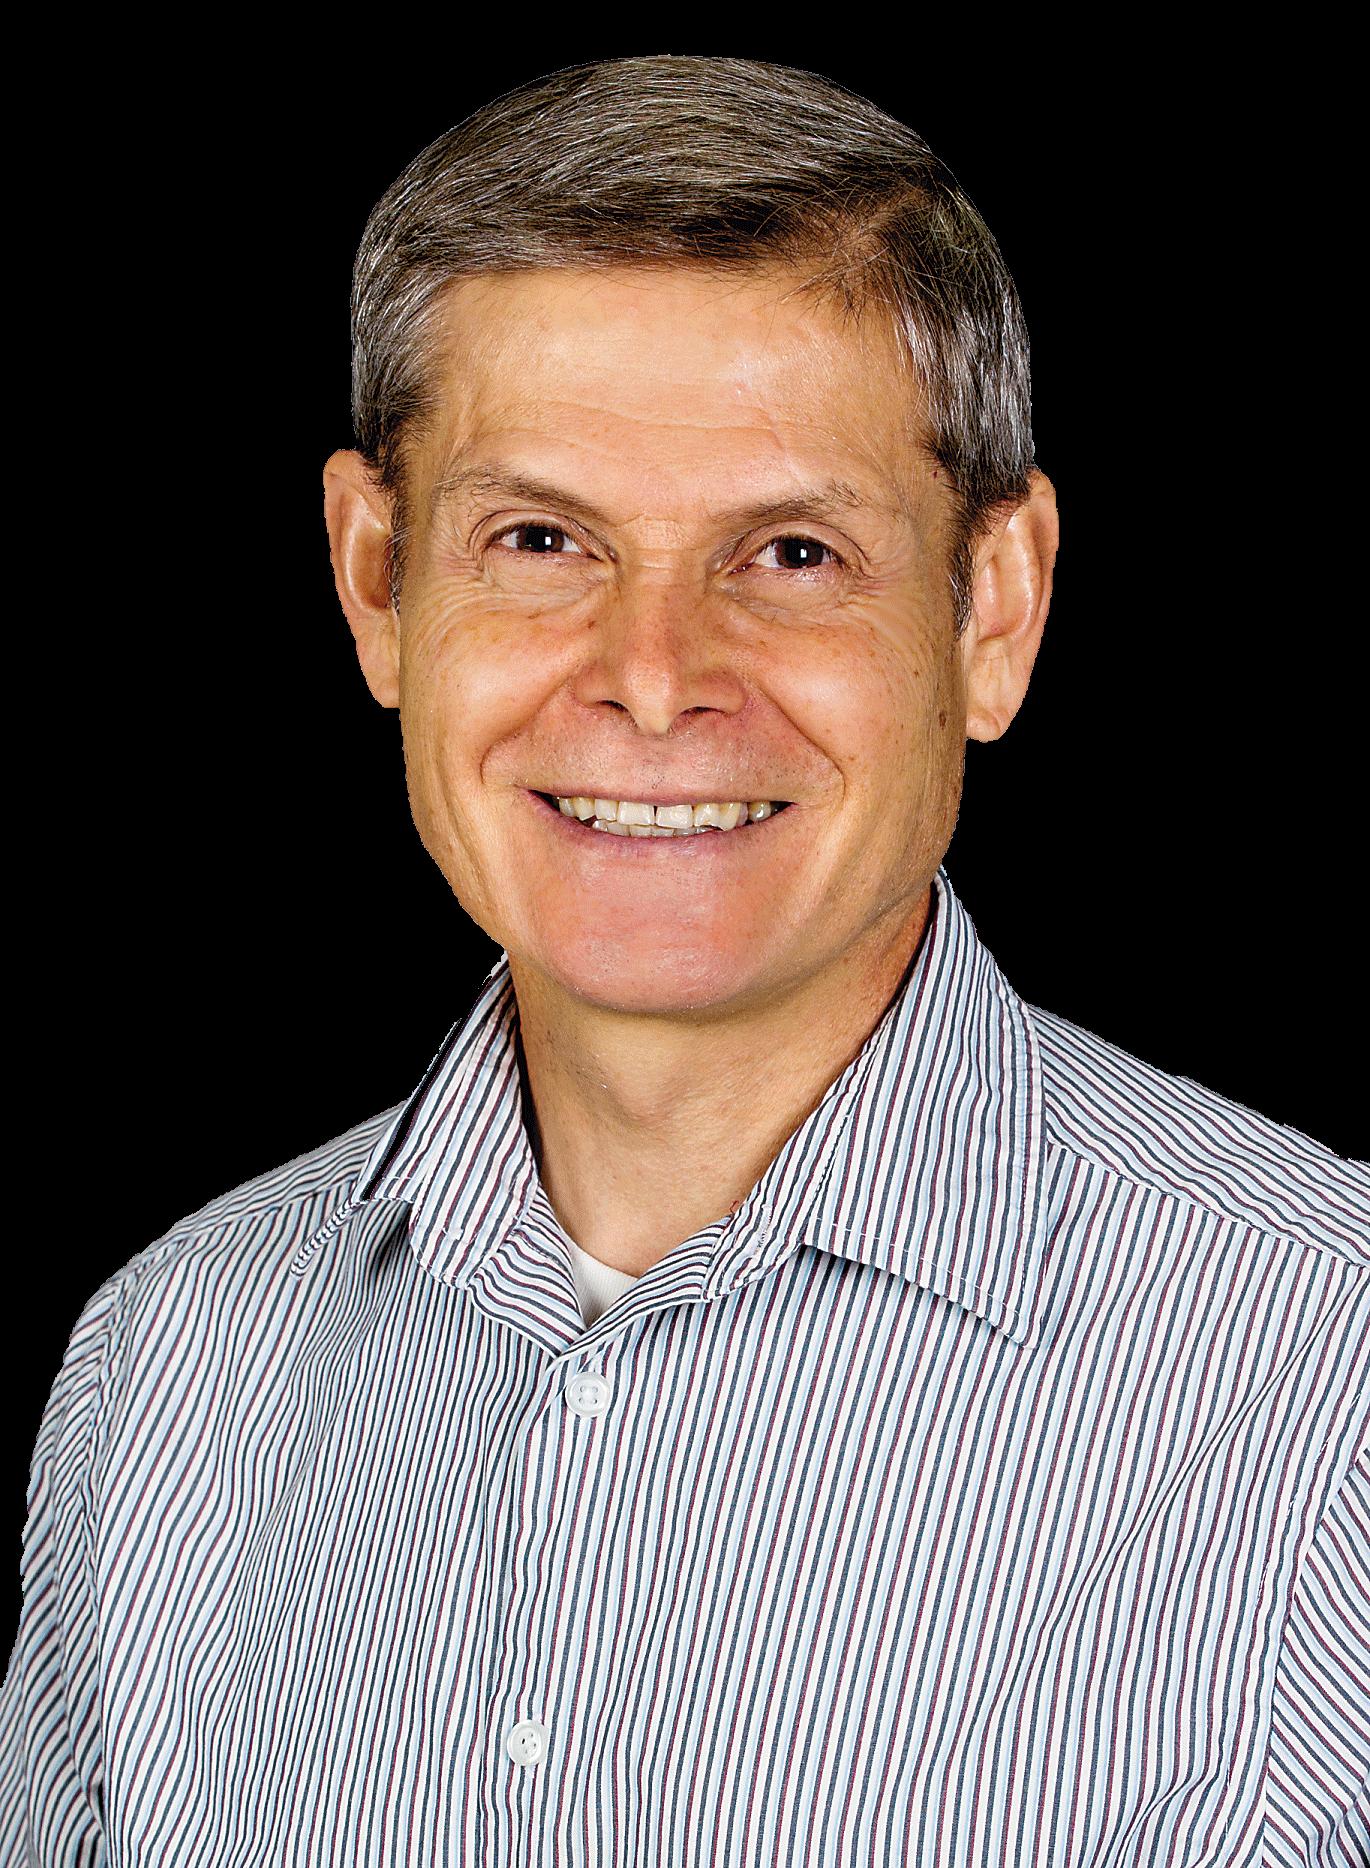 Rudy Scarfalloto